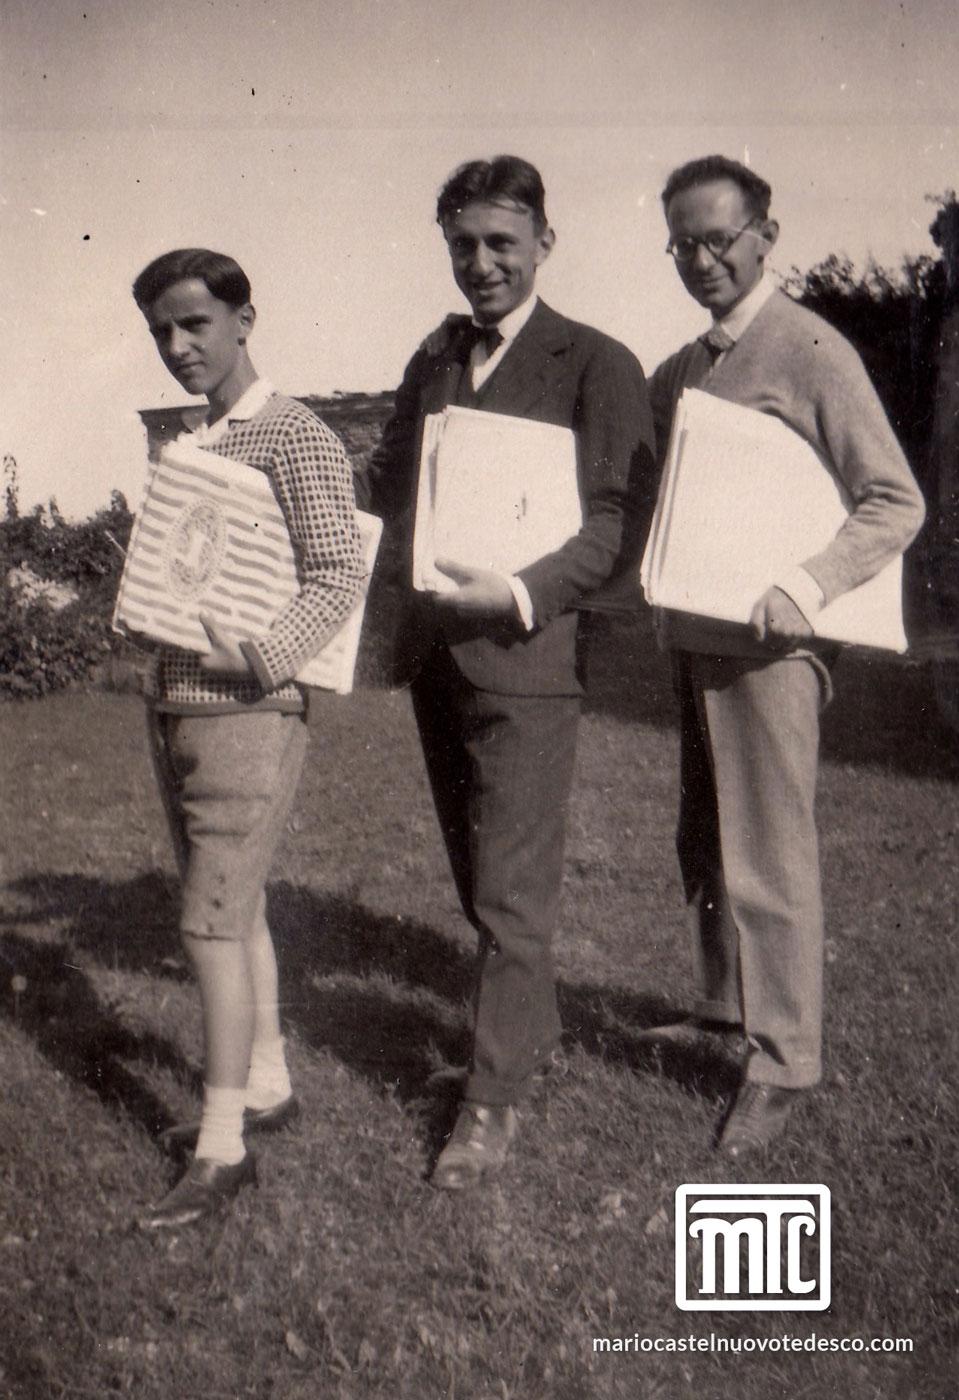 Nino Rota, Virgilio Mortari, MCT, Usigliano, 1926